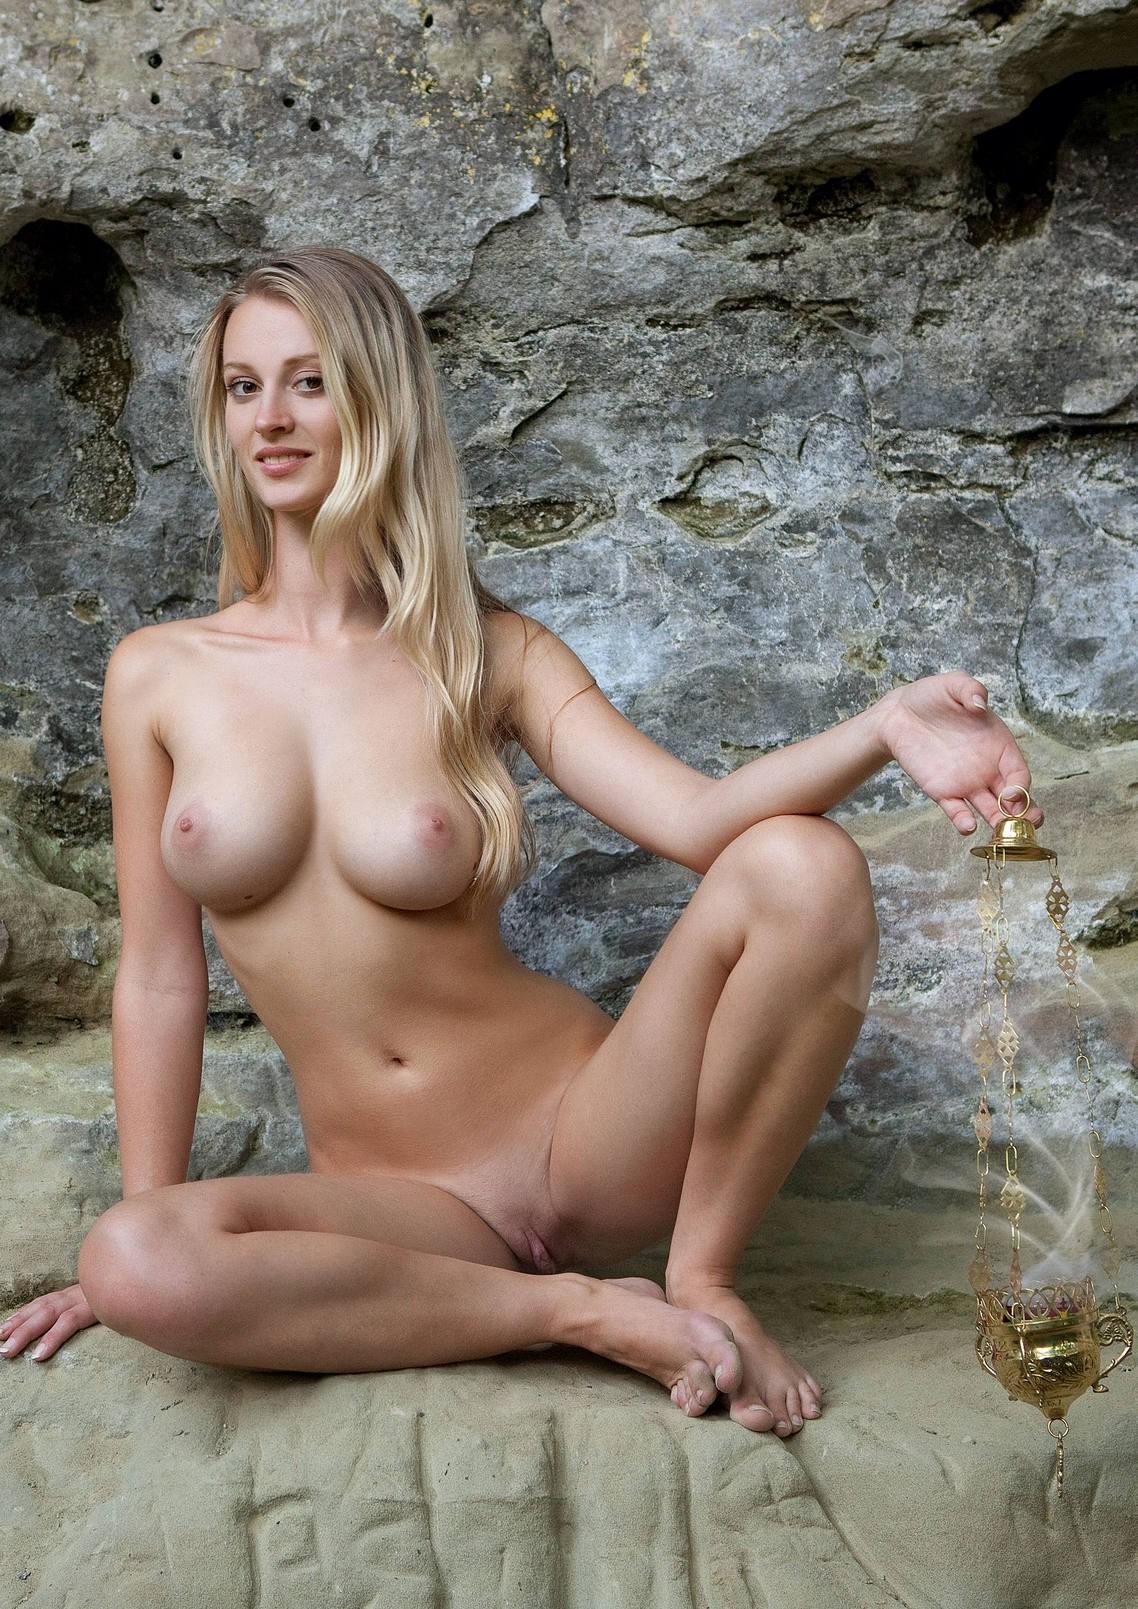 Public flashing stripping nude